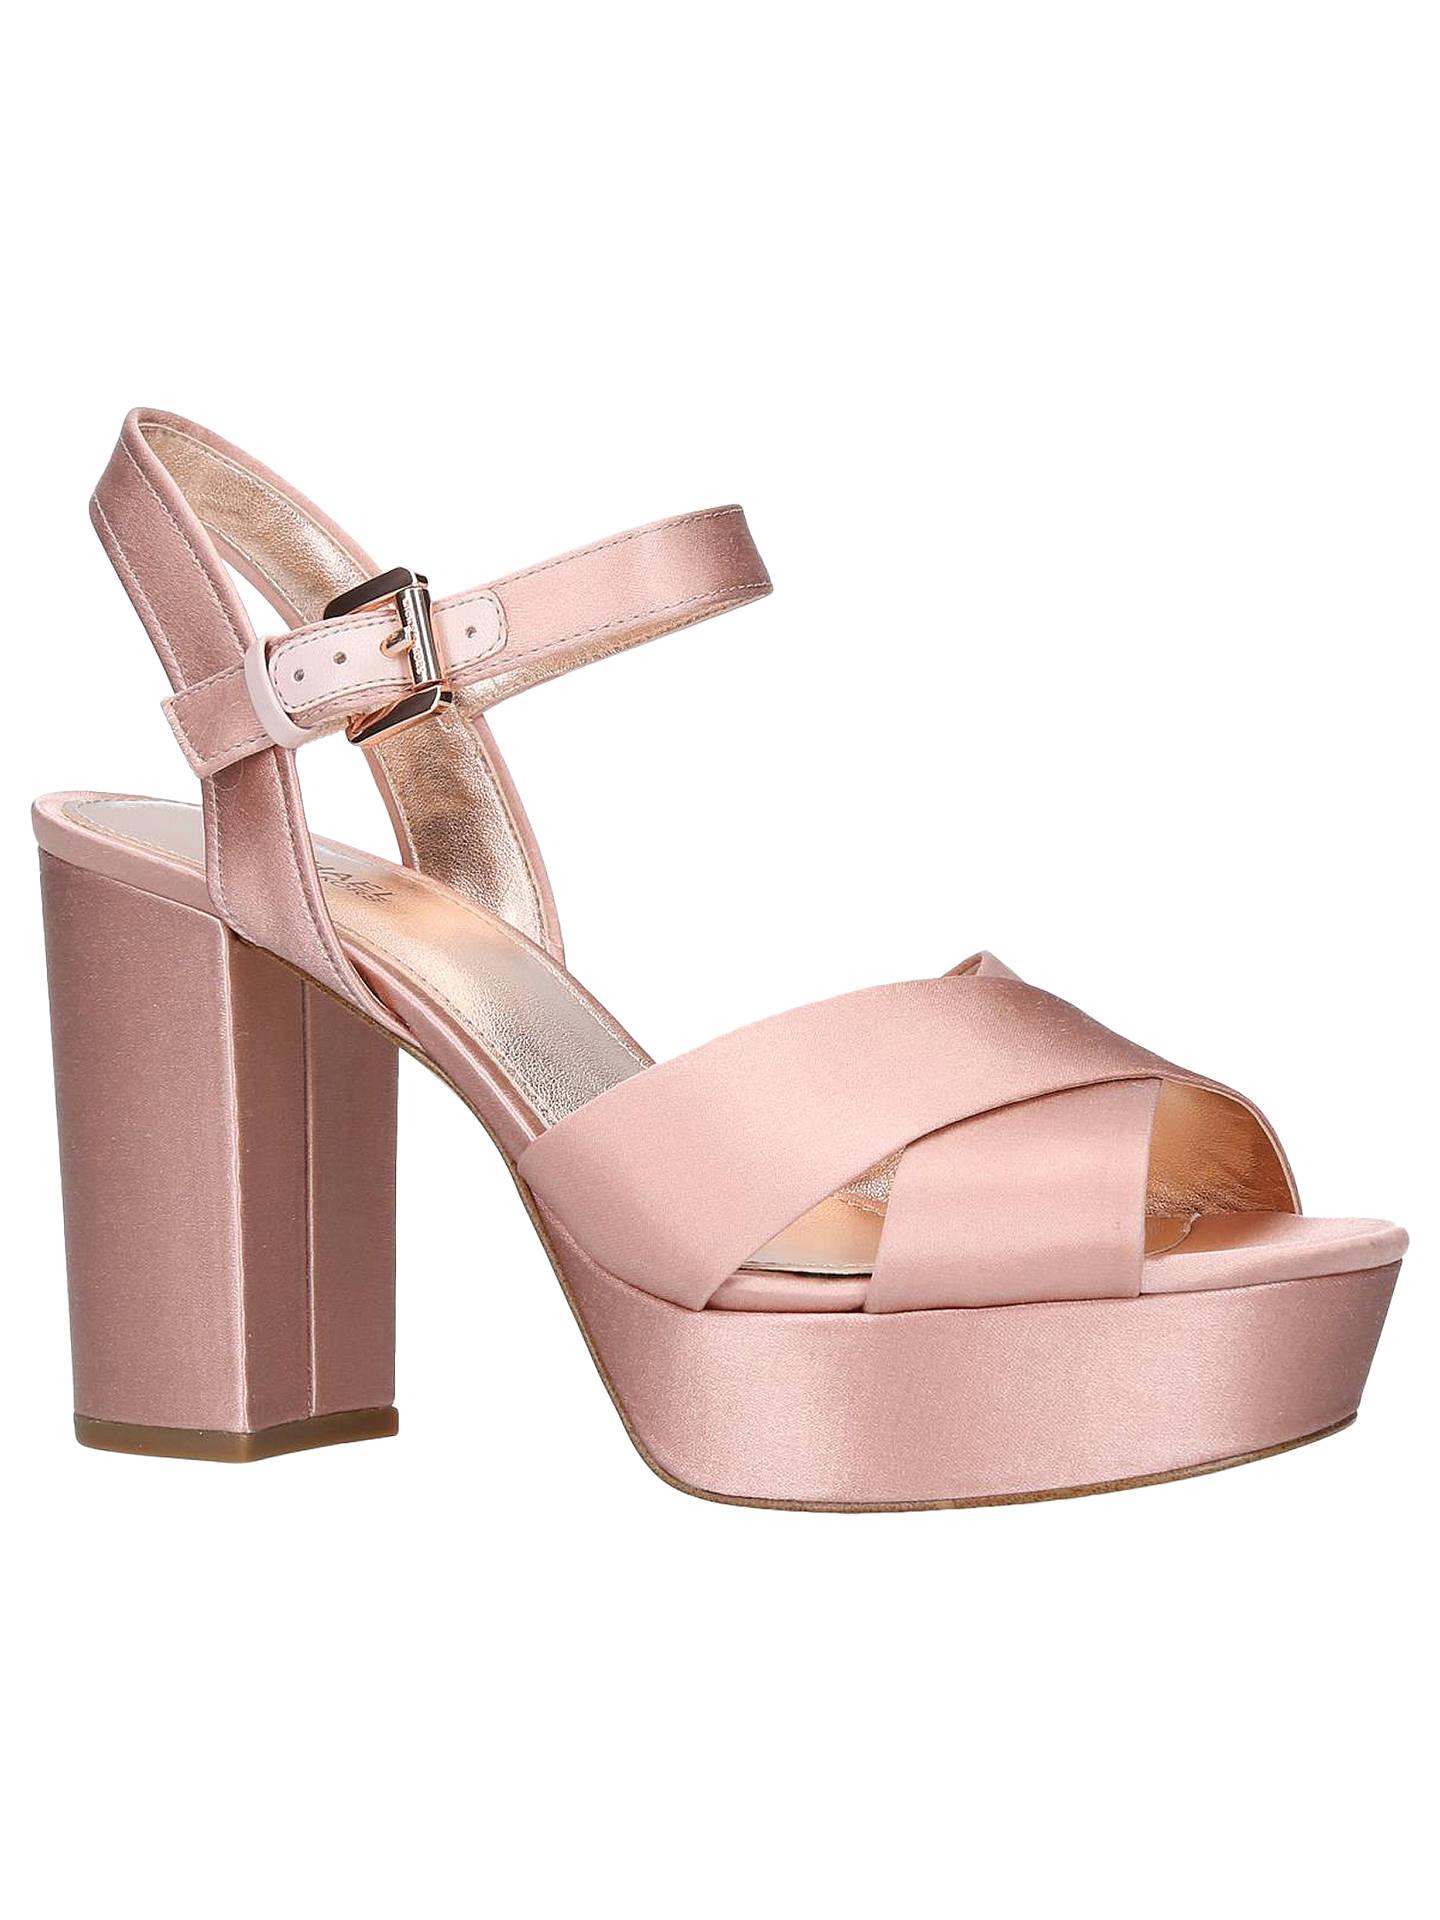 1b5bea22f0f Buy MICHAEL Michael Kors Divia Block Heel Platform Sandals